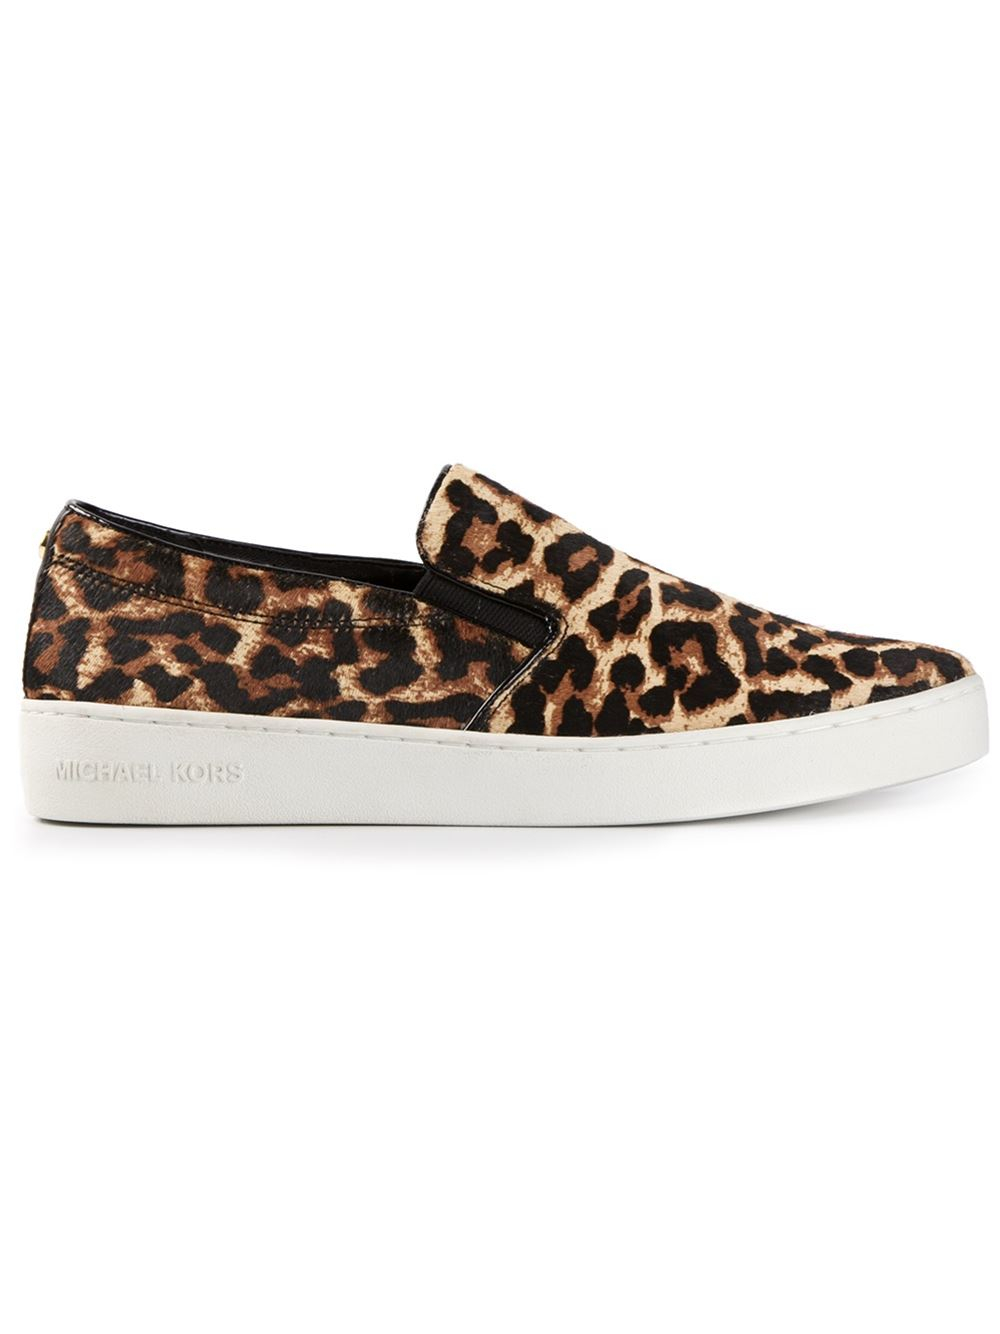 83691e923932 Lyst - Michael Kors Keaton Leopard Print Slipon Sneakers in Black